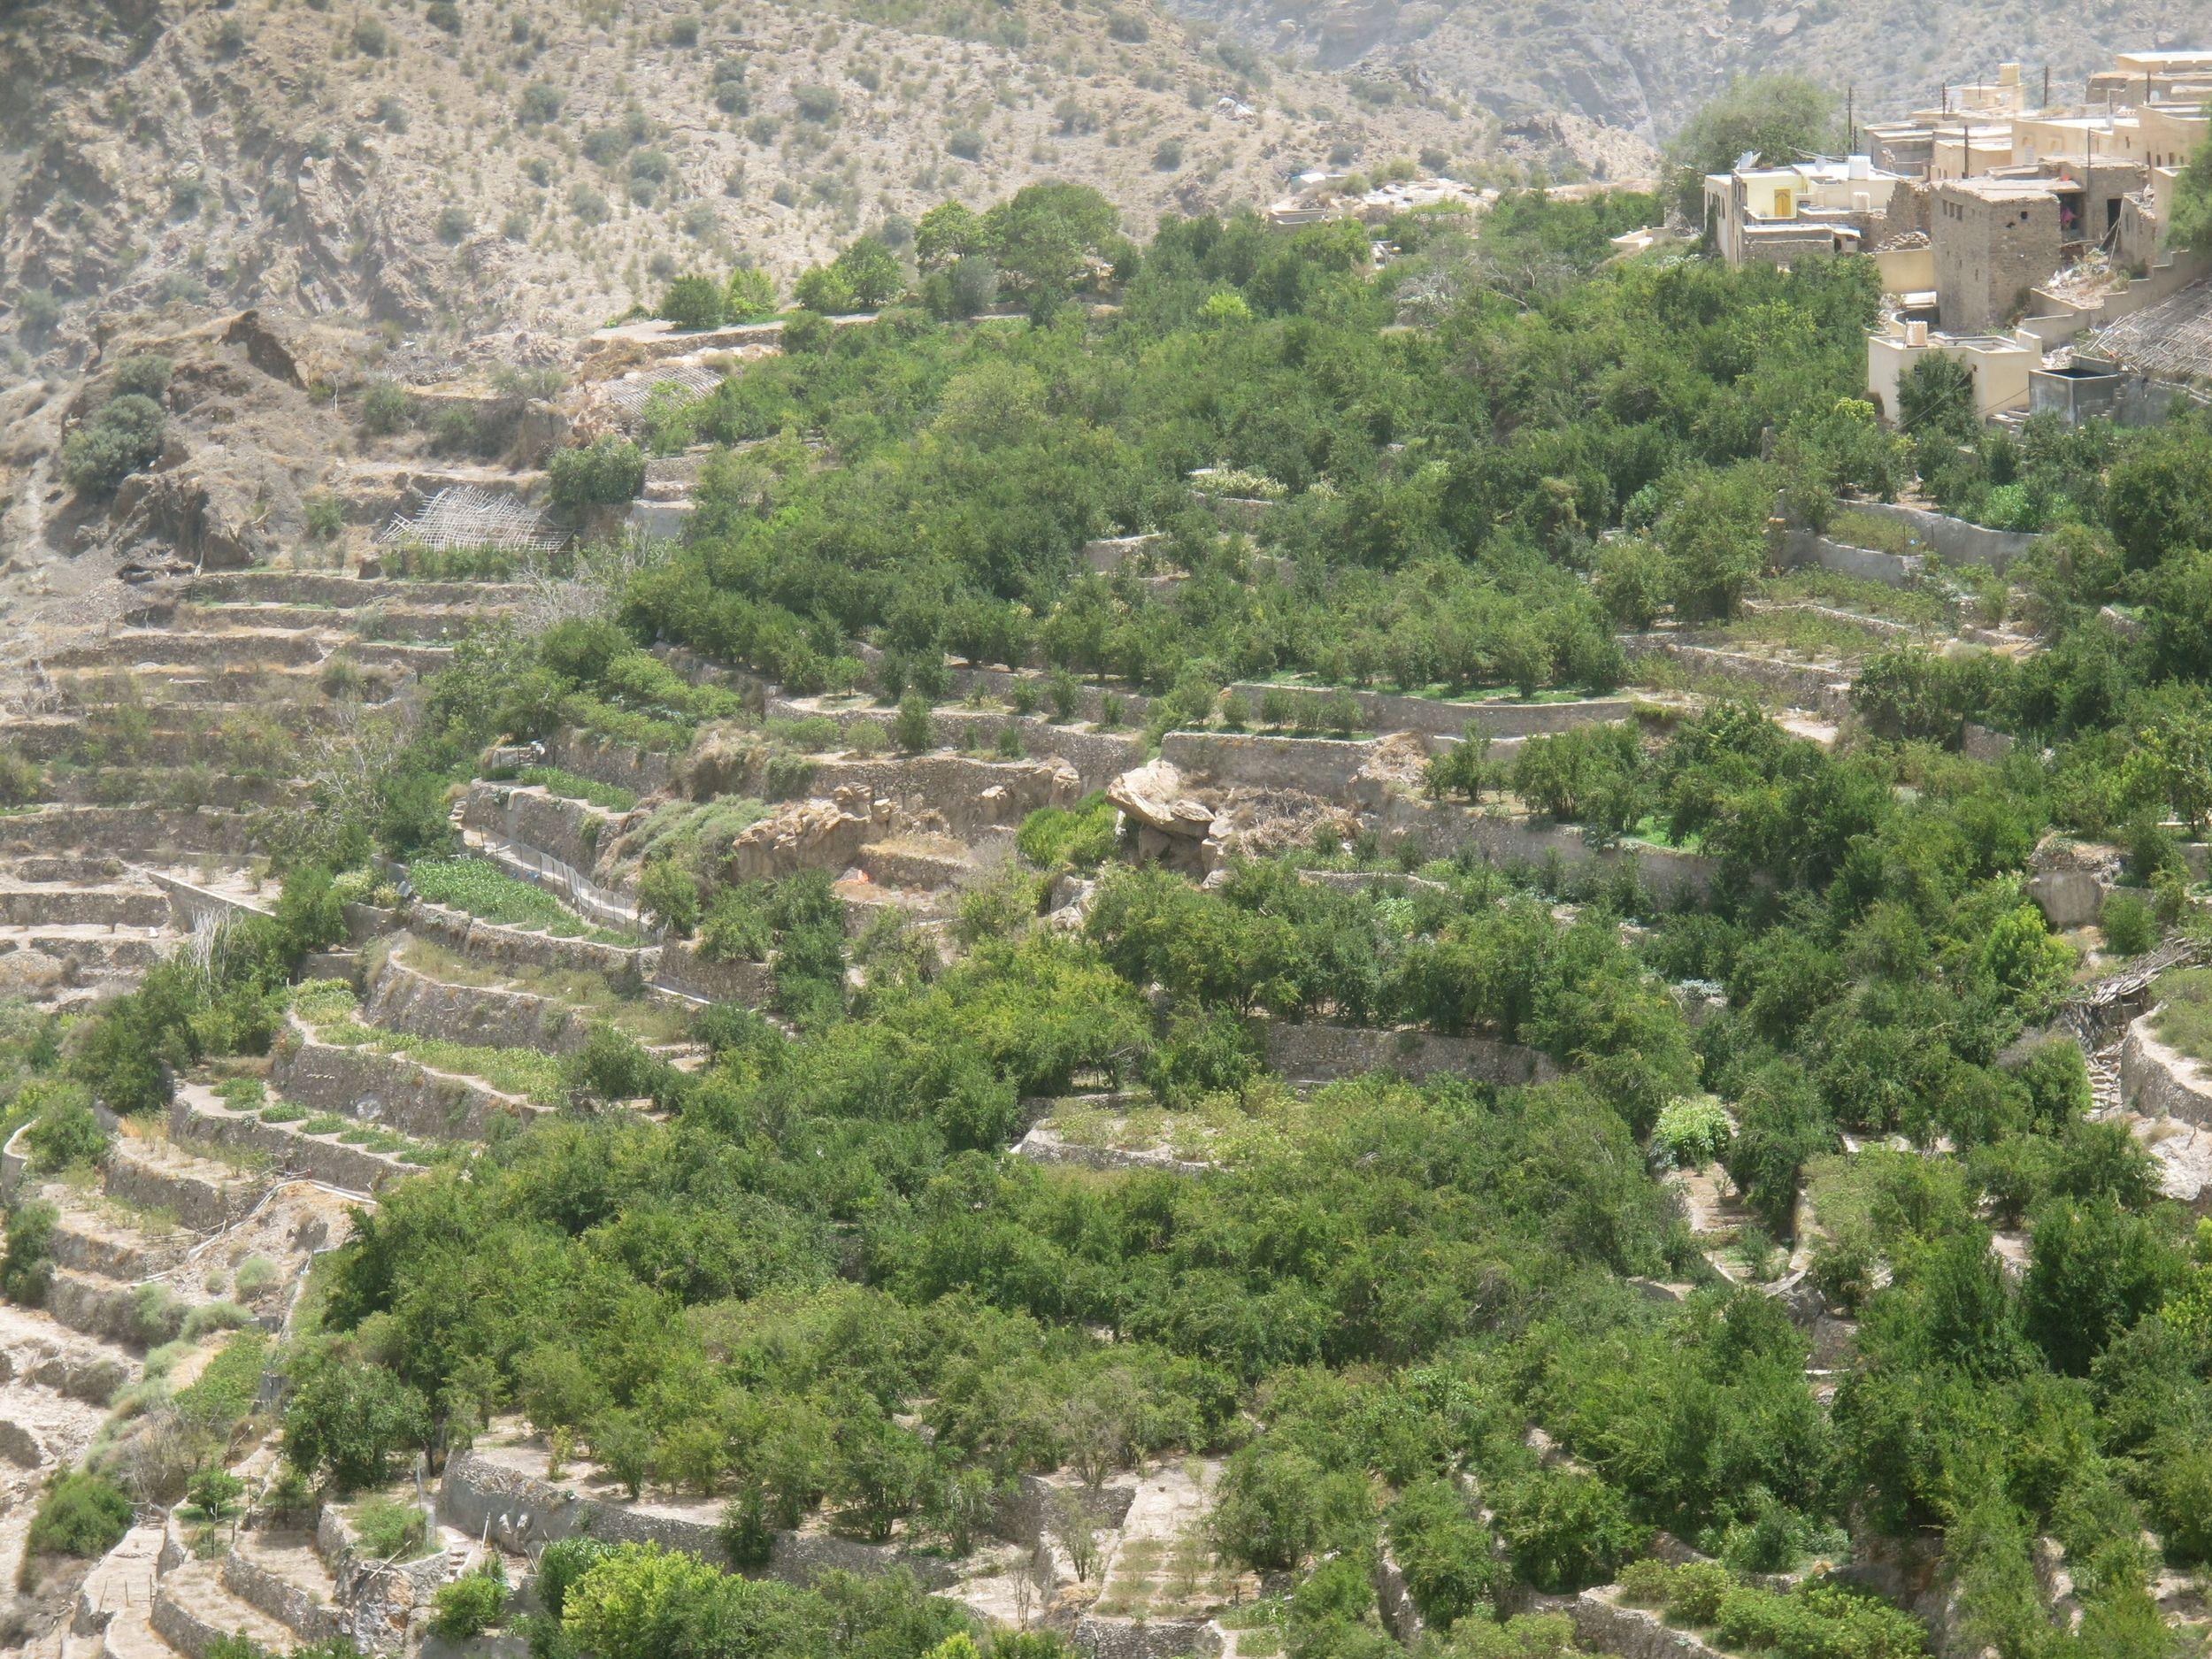 Terraced farmland in the Hajar Mountains at Jebel Akhdar